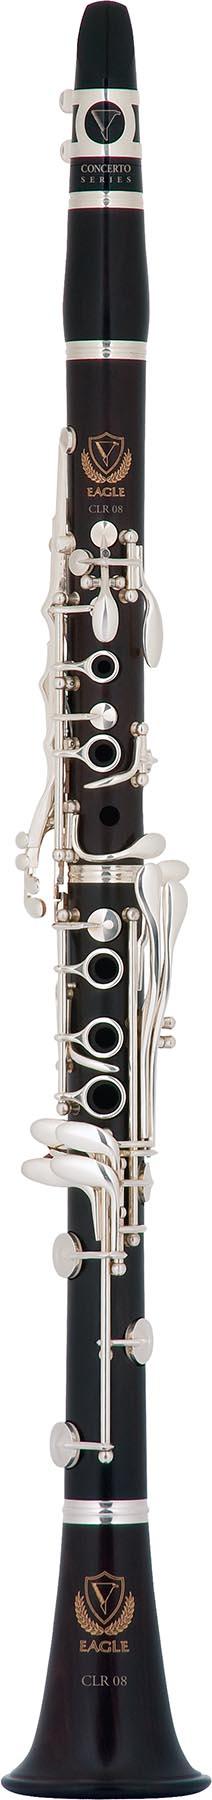 clr08 clarinete madeira rosewood jacaranda eagle clr08 vertical